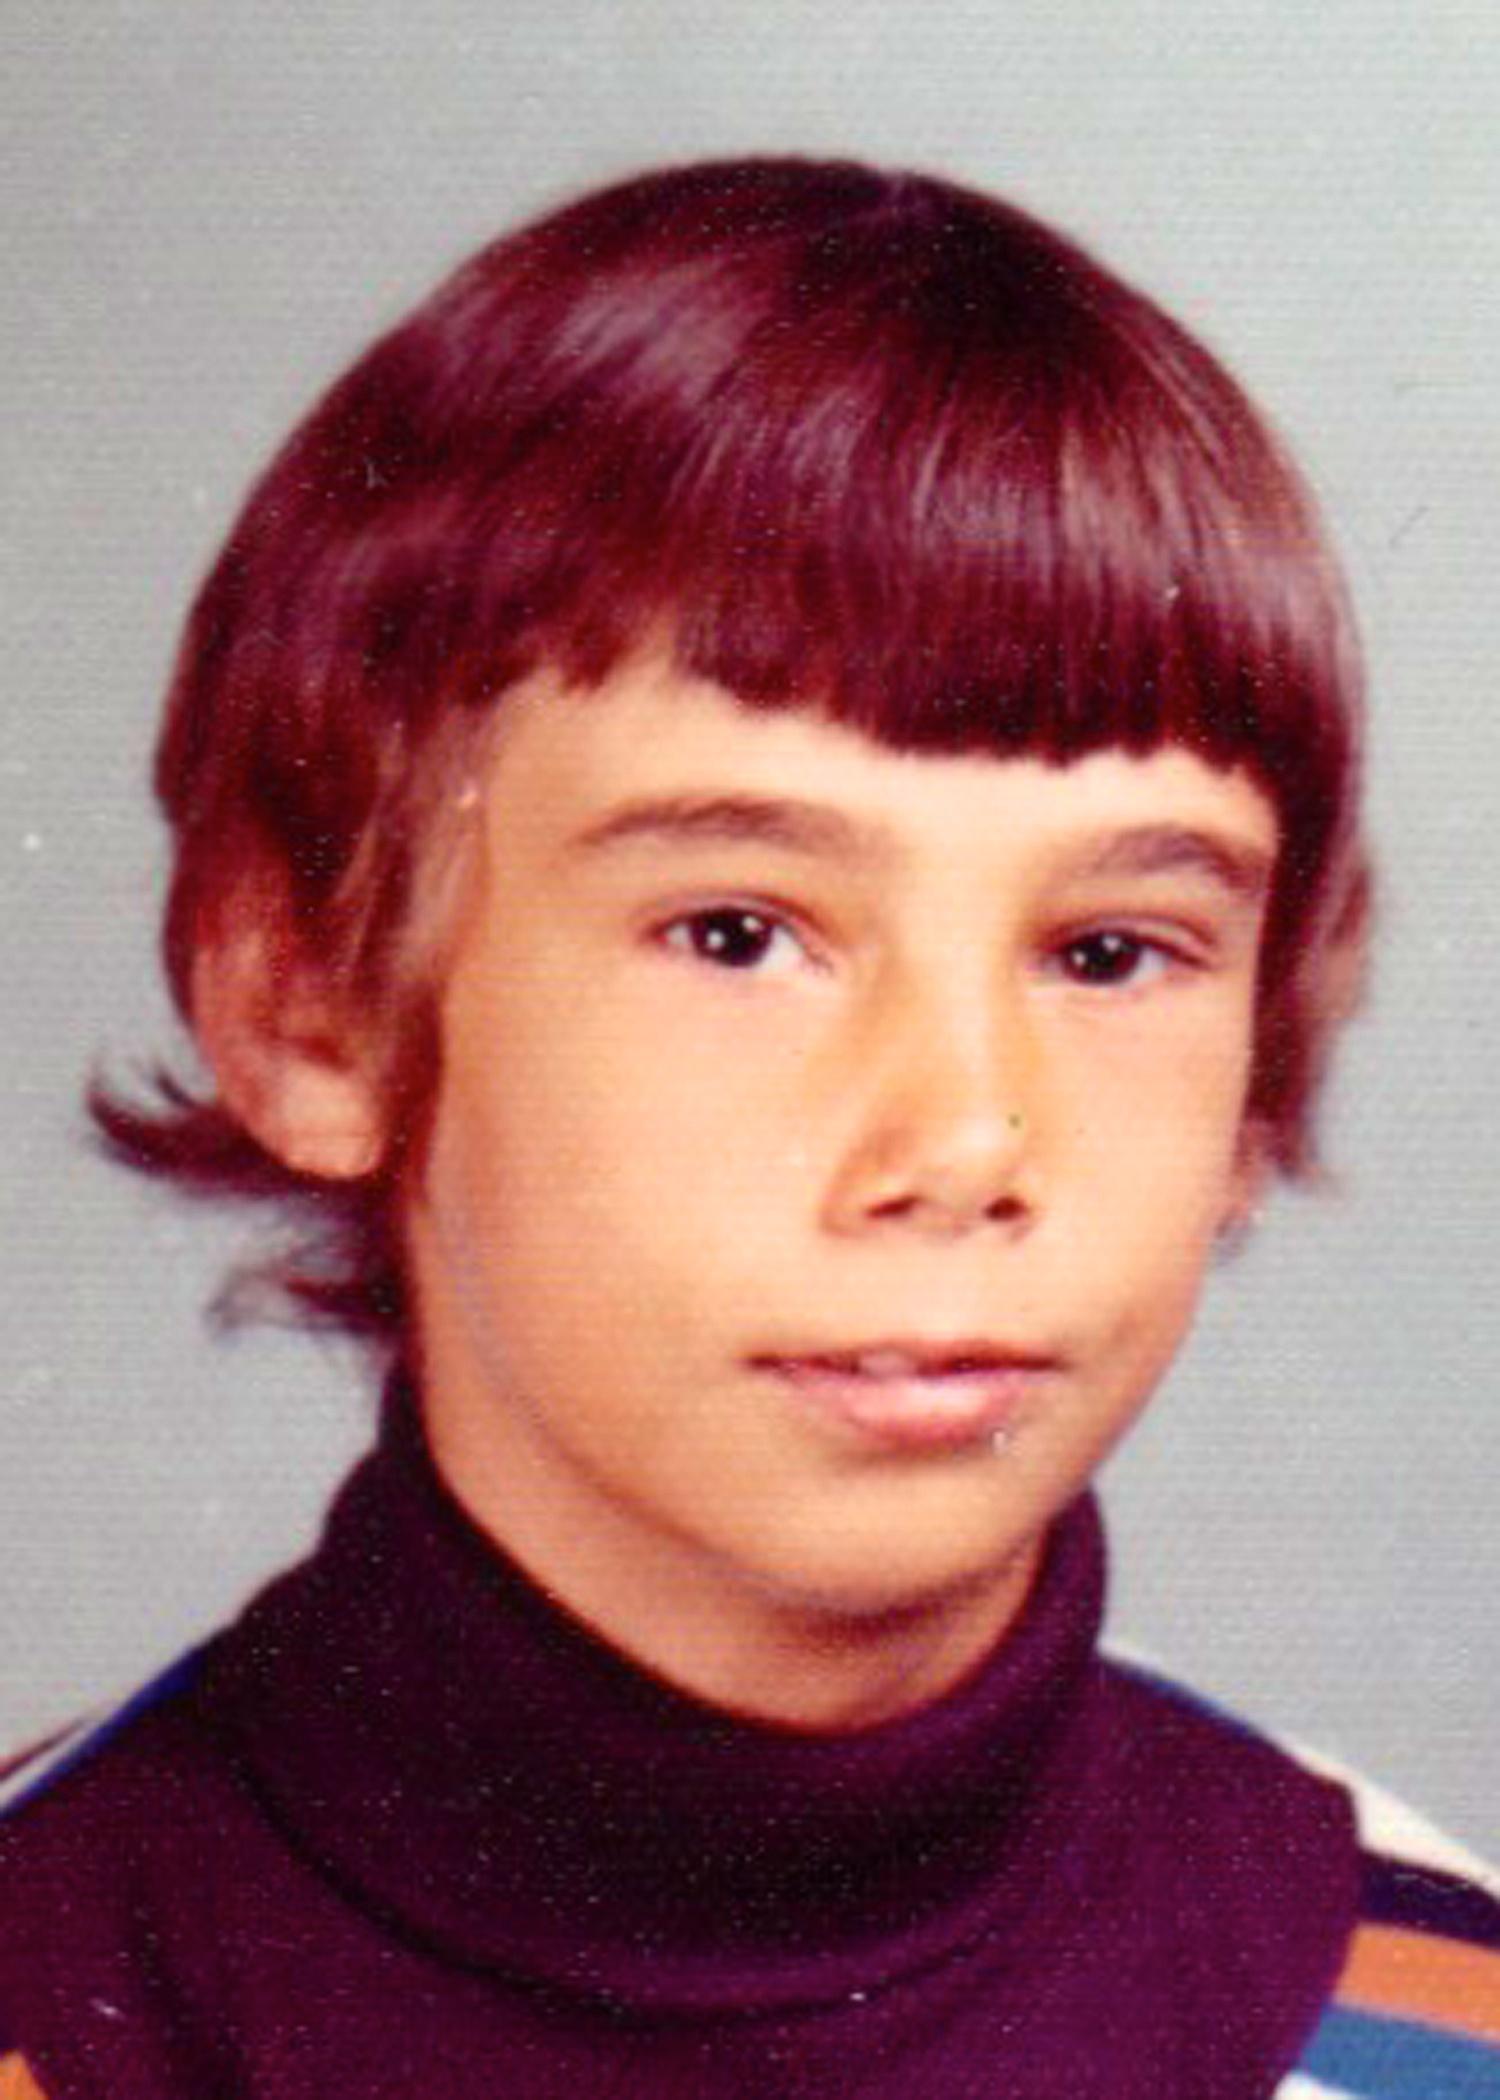 PghArtist: Age 8